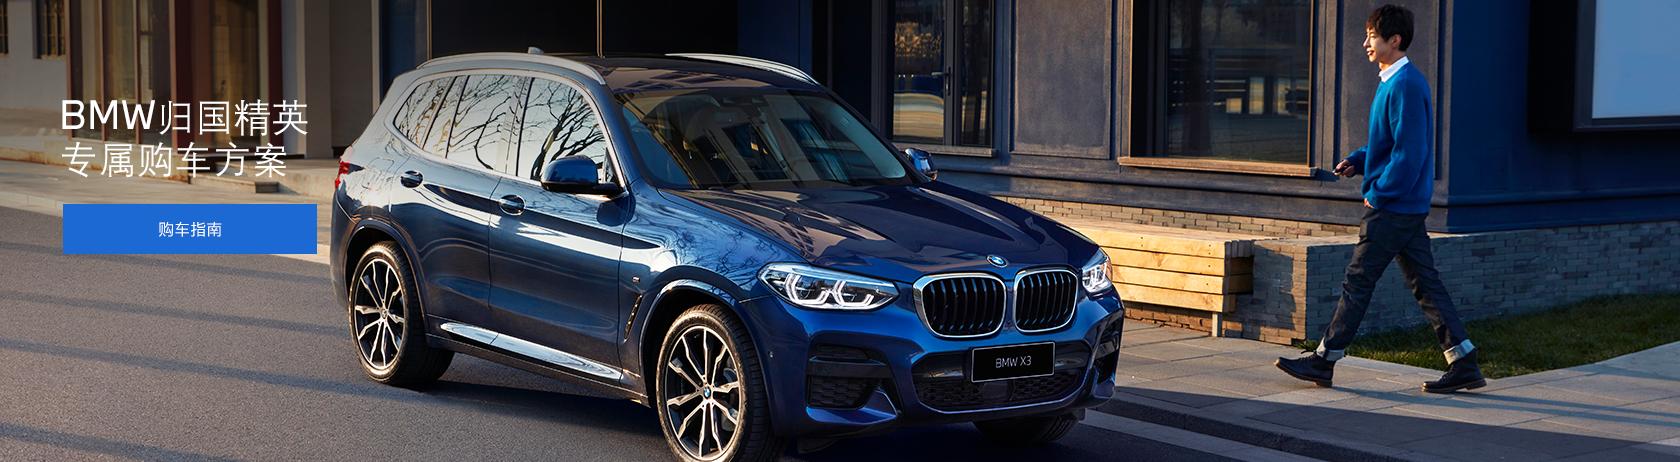 BMW归国精英专属购车方案